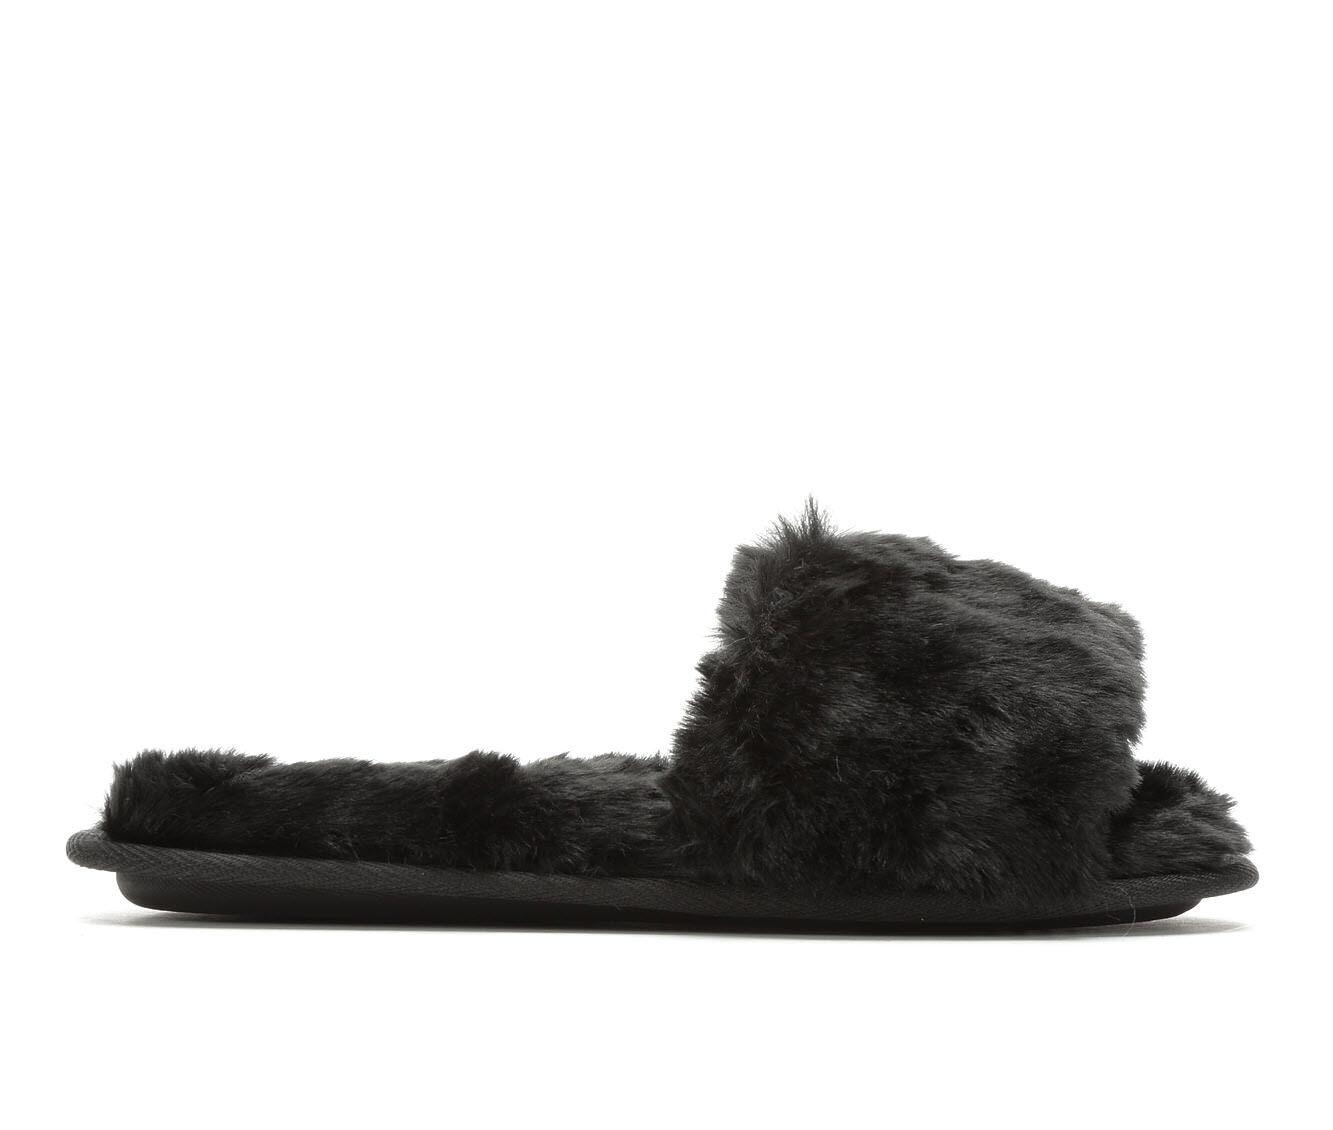 Jessica Simpson Furry Slide Black